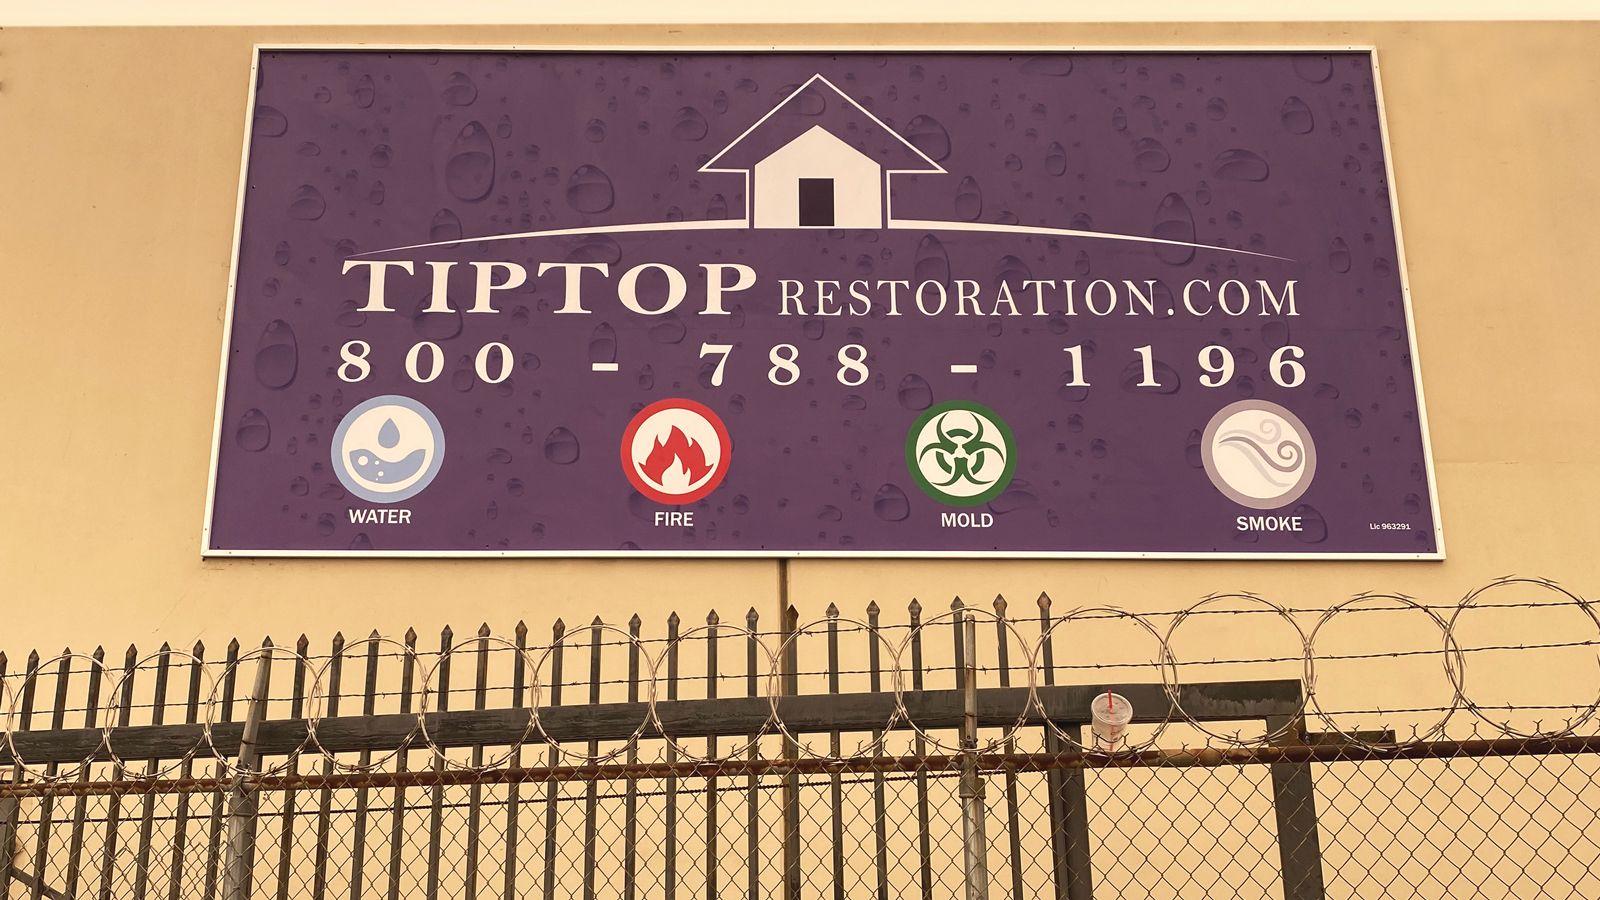 tip top restoration aluminum sign